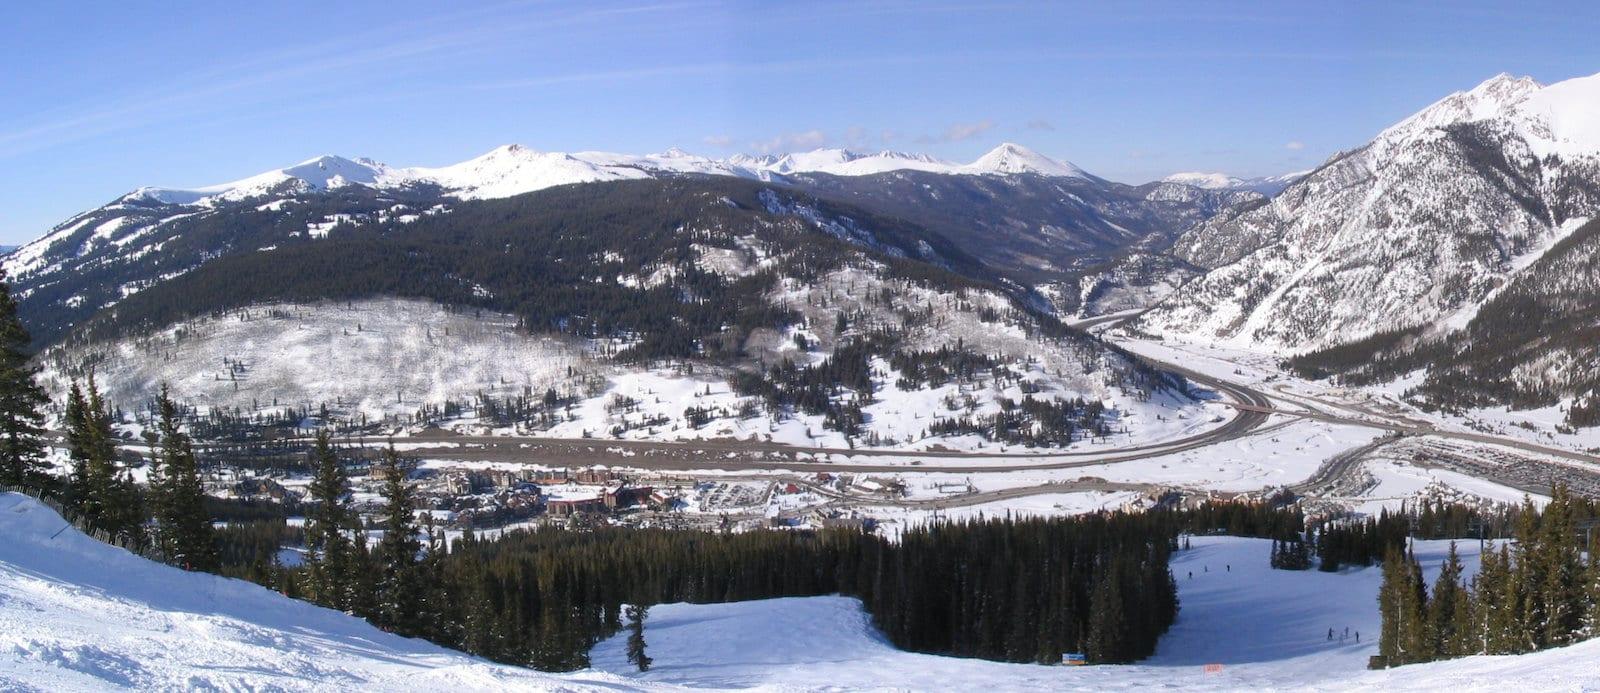 Copper Mountain Colorado Aerial View